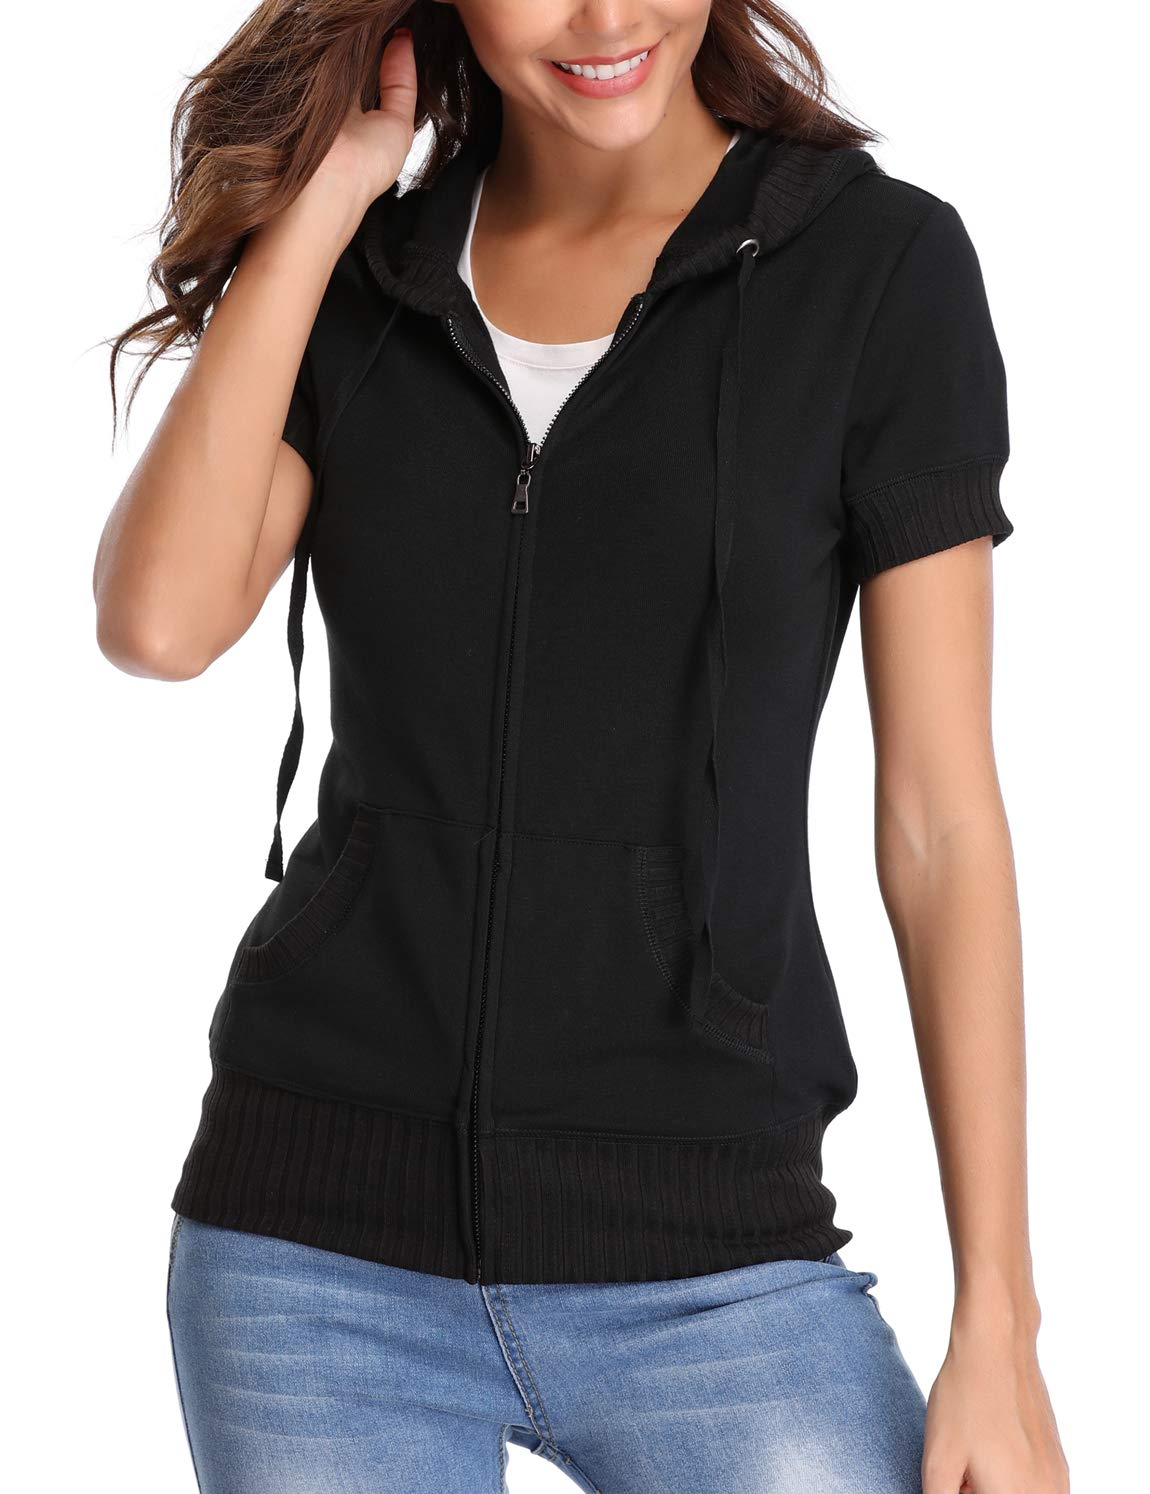 MISS MOLY Autumn Hoodie Zip up Short Sleeve Jacket for Women Thin Sweater Sweatshirt Summer Lightweight Coat